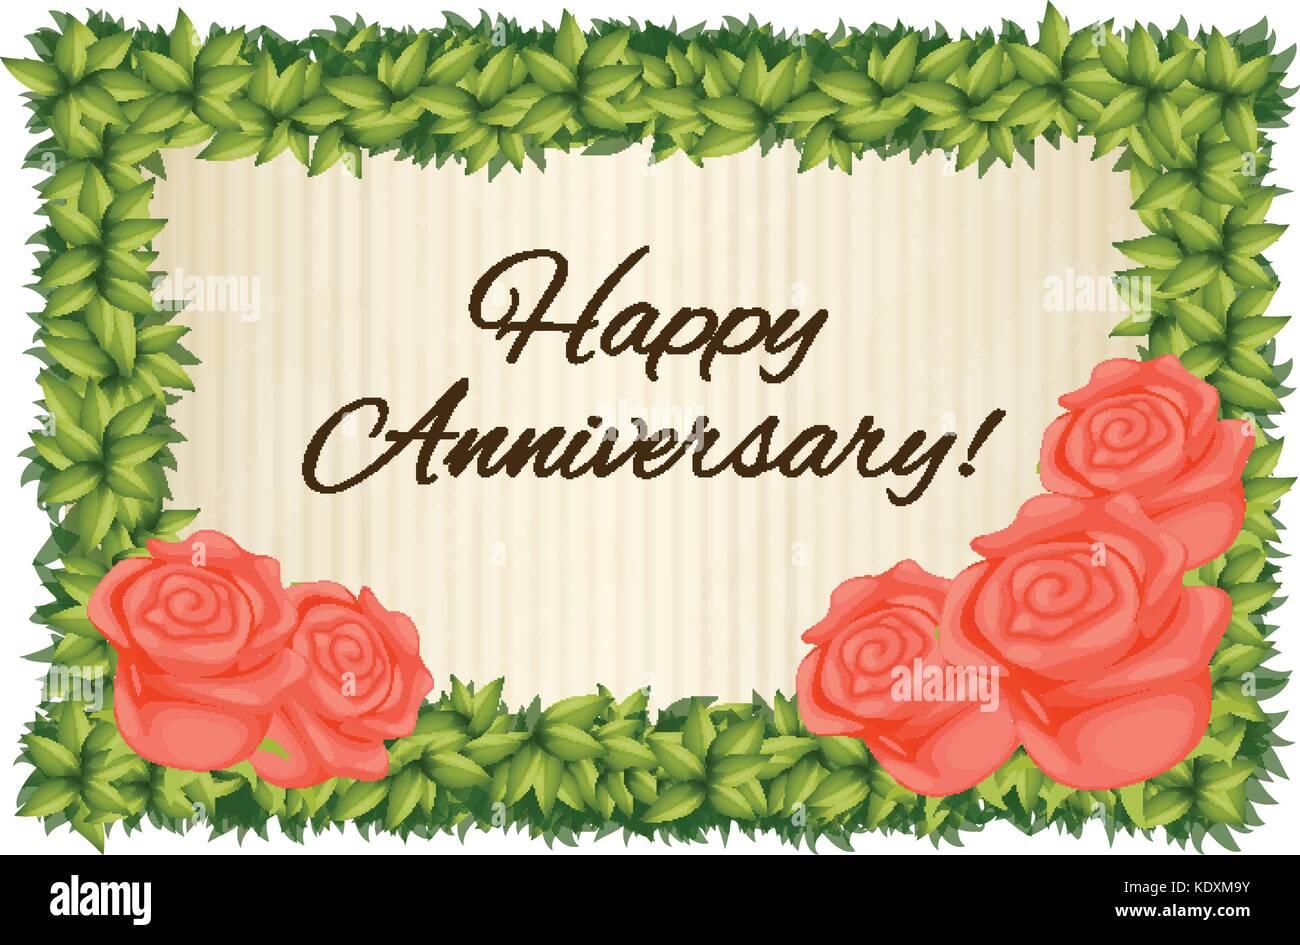 Happy Anniversary Stock Vector Images - Alamy